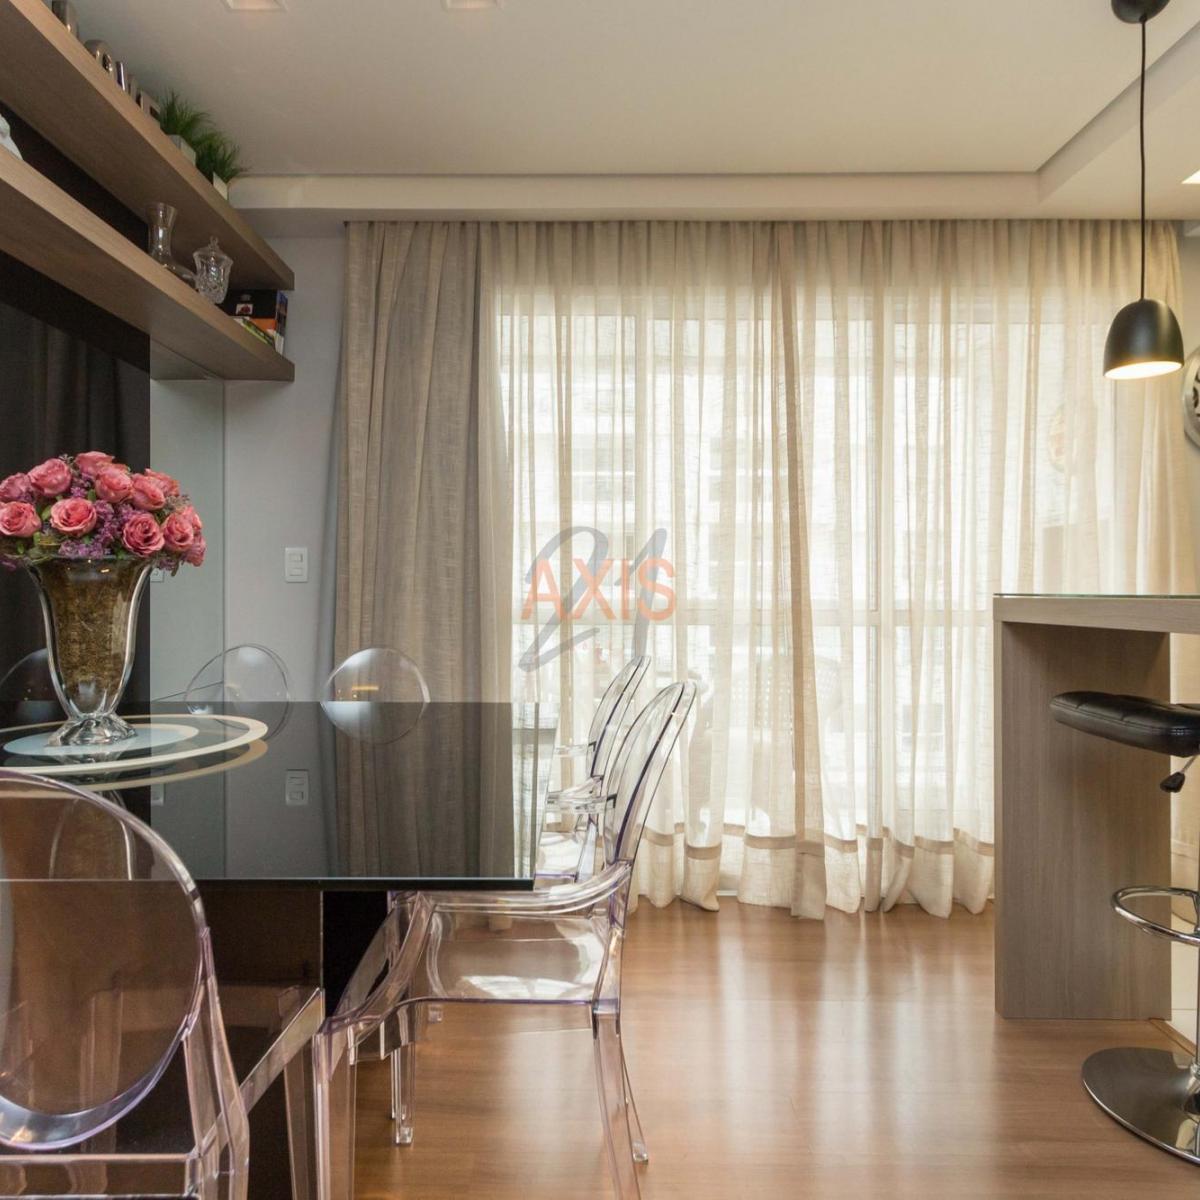 http://www.infocenterhost2.com.br/crm/fotosimovel/240276/71978187-apartamento-curitiba-cristo-rei_marcadagua.jpg